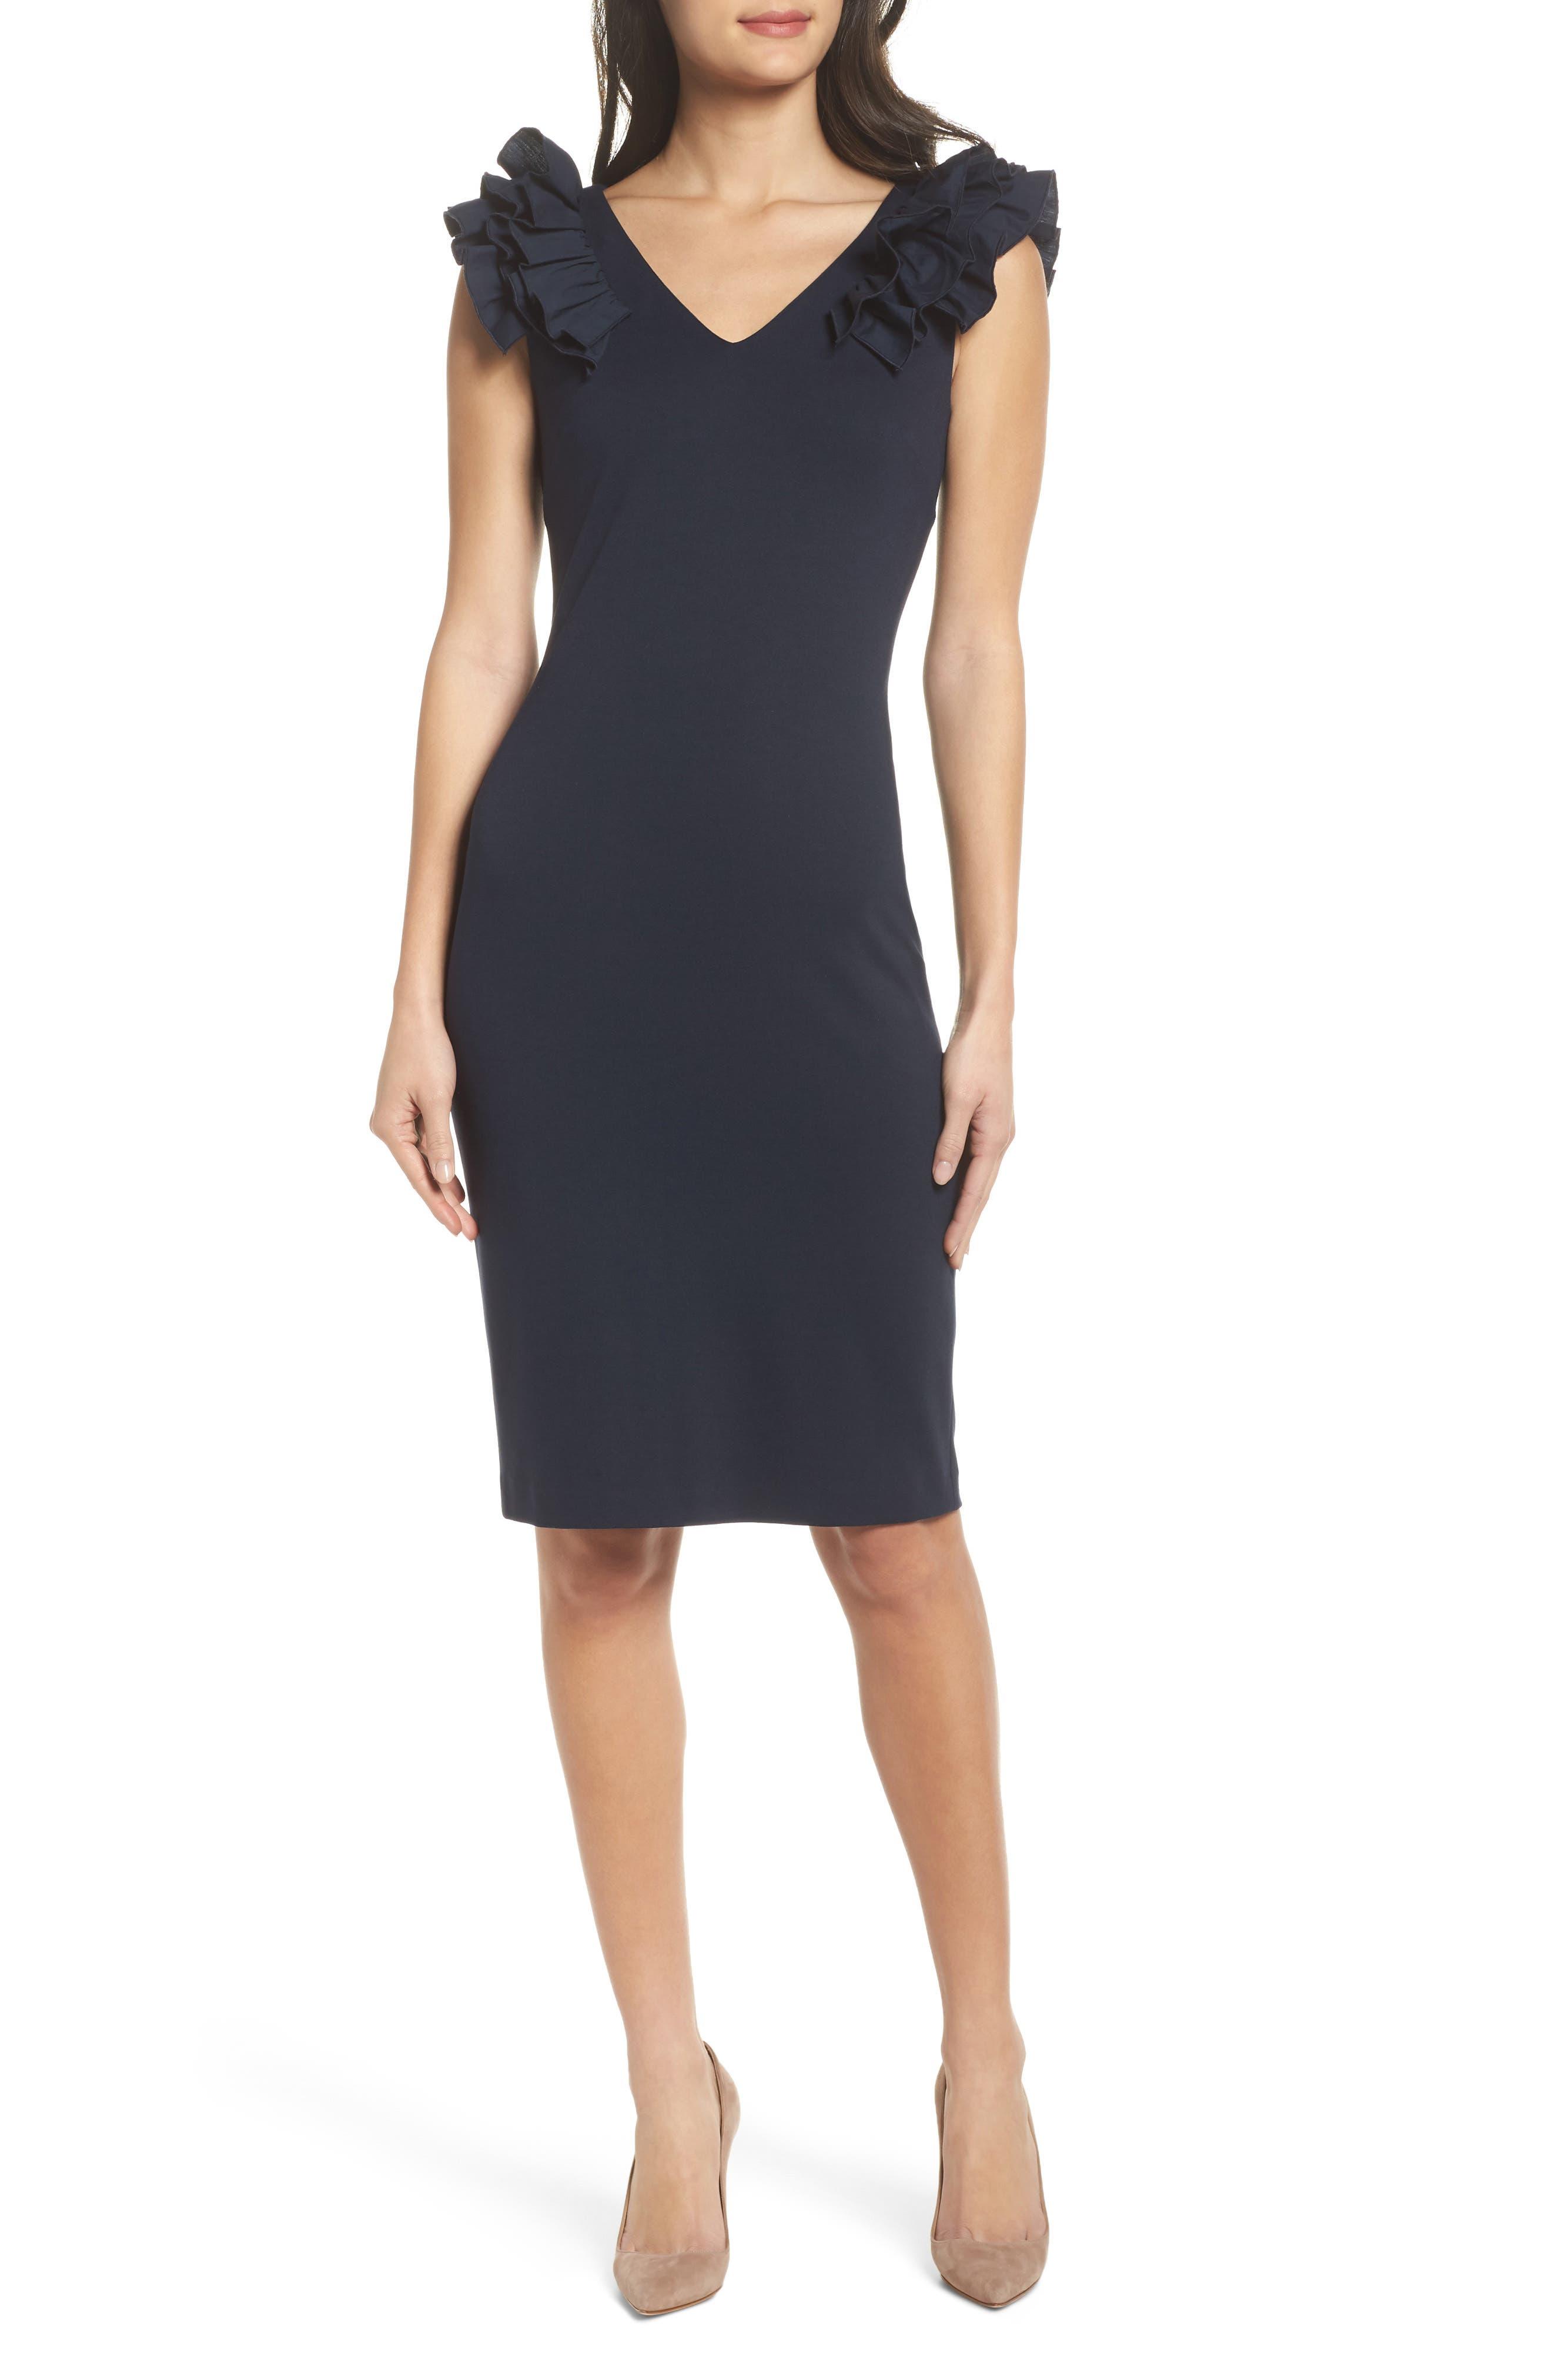 Alternate Image 1 Selected - Chelsea28 Ruffle Sheath Dress